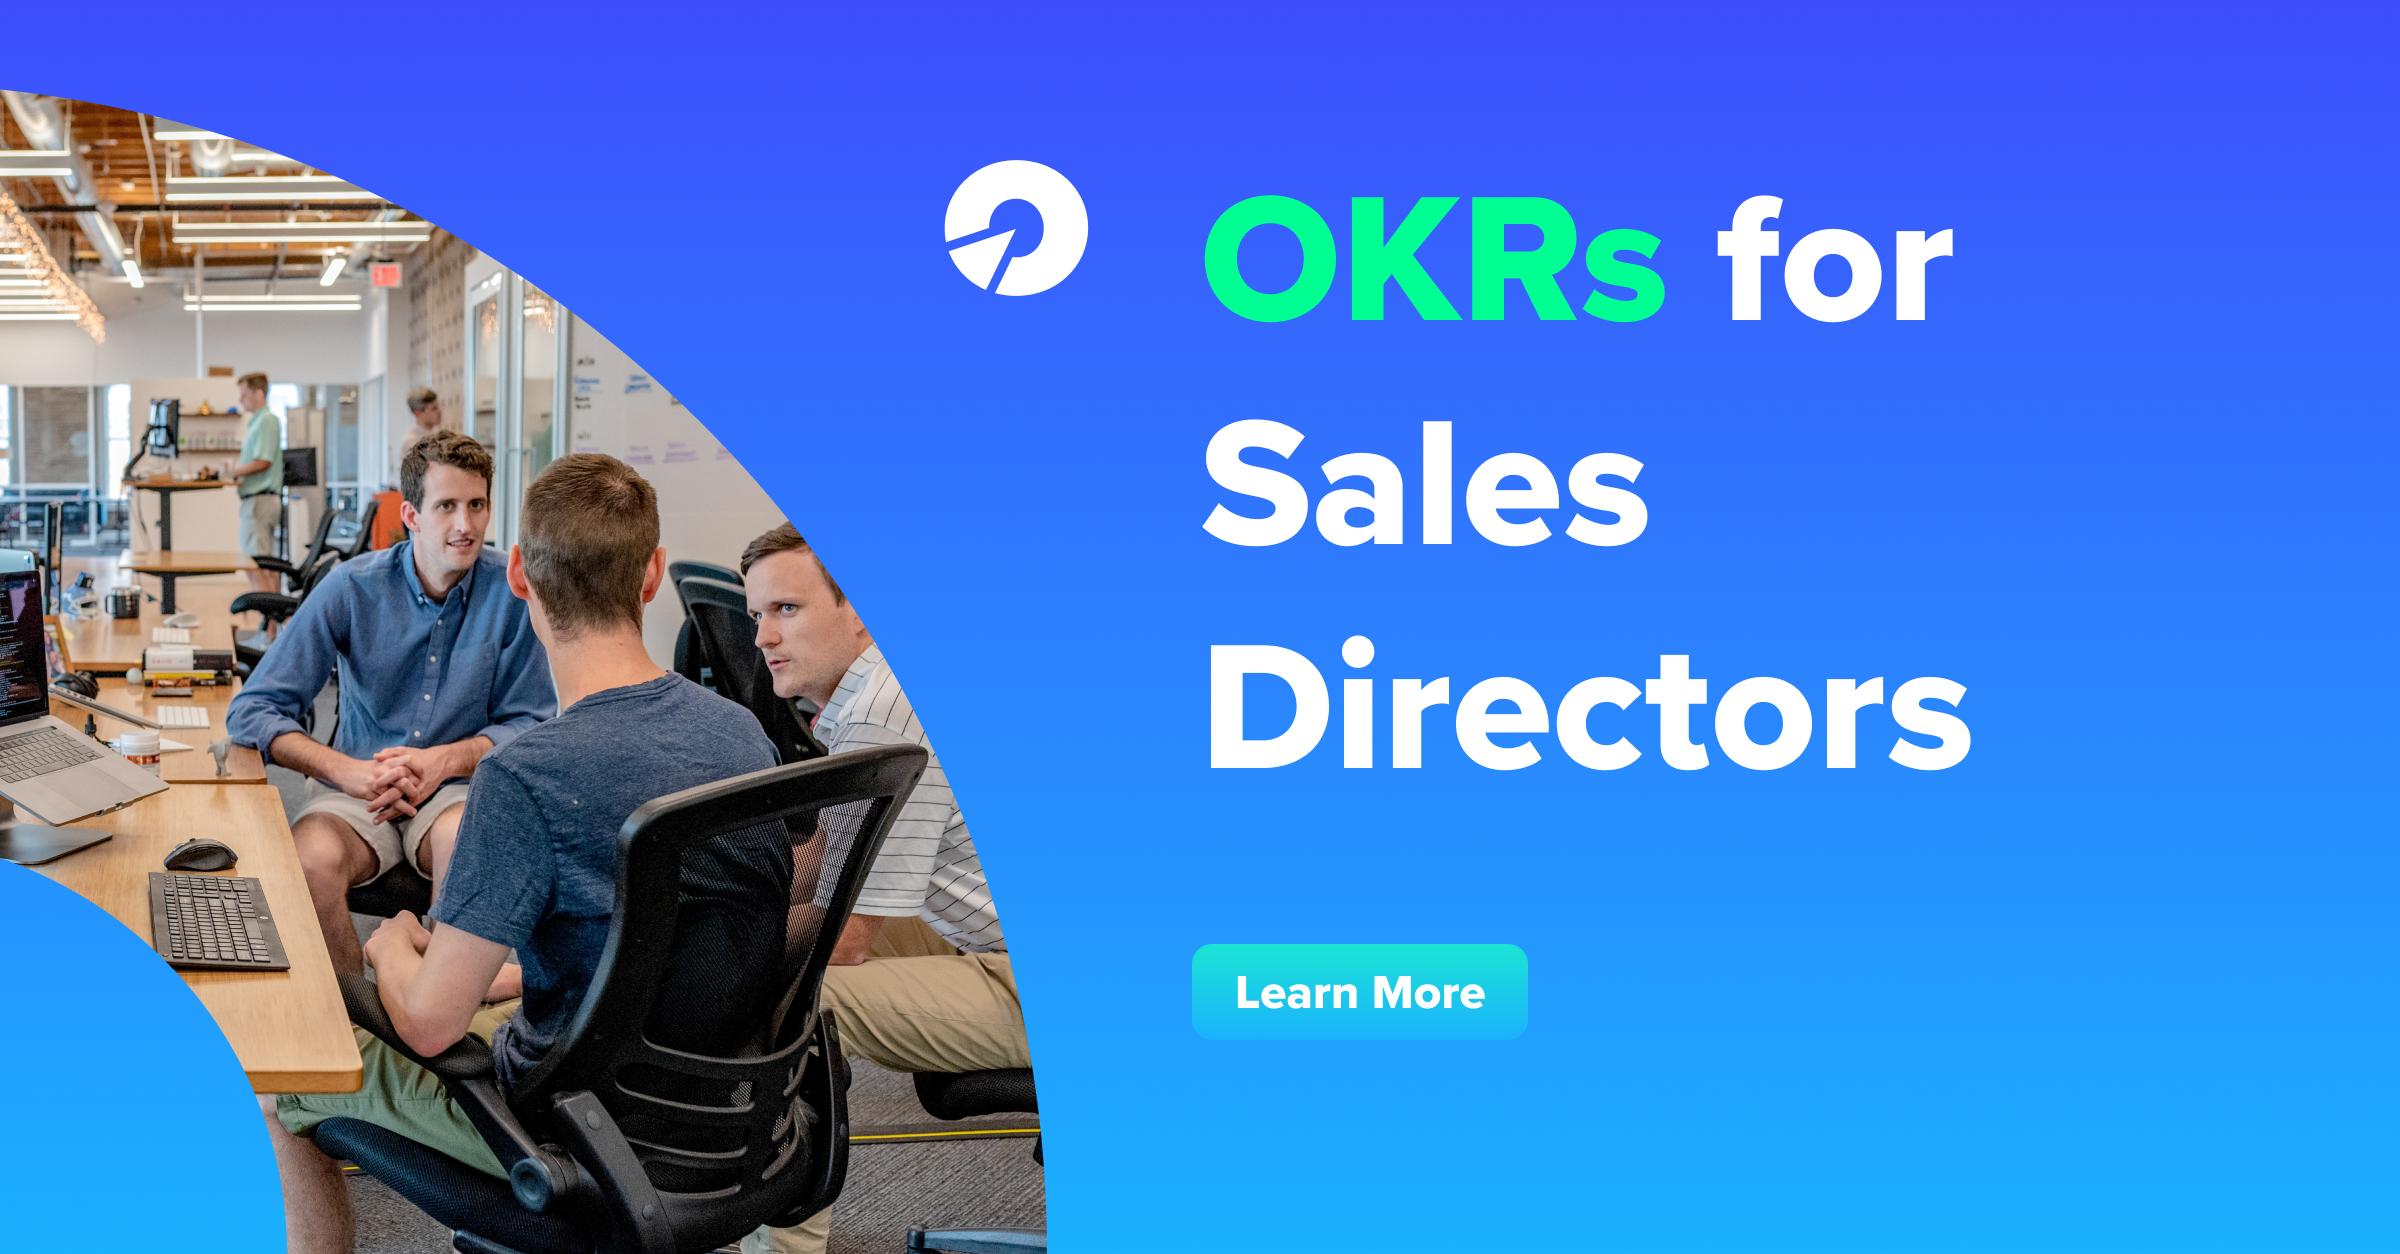 Sales OKRs for Sales Directors